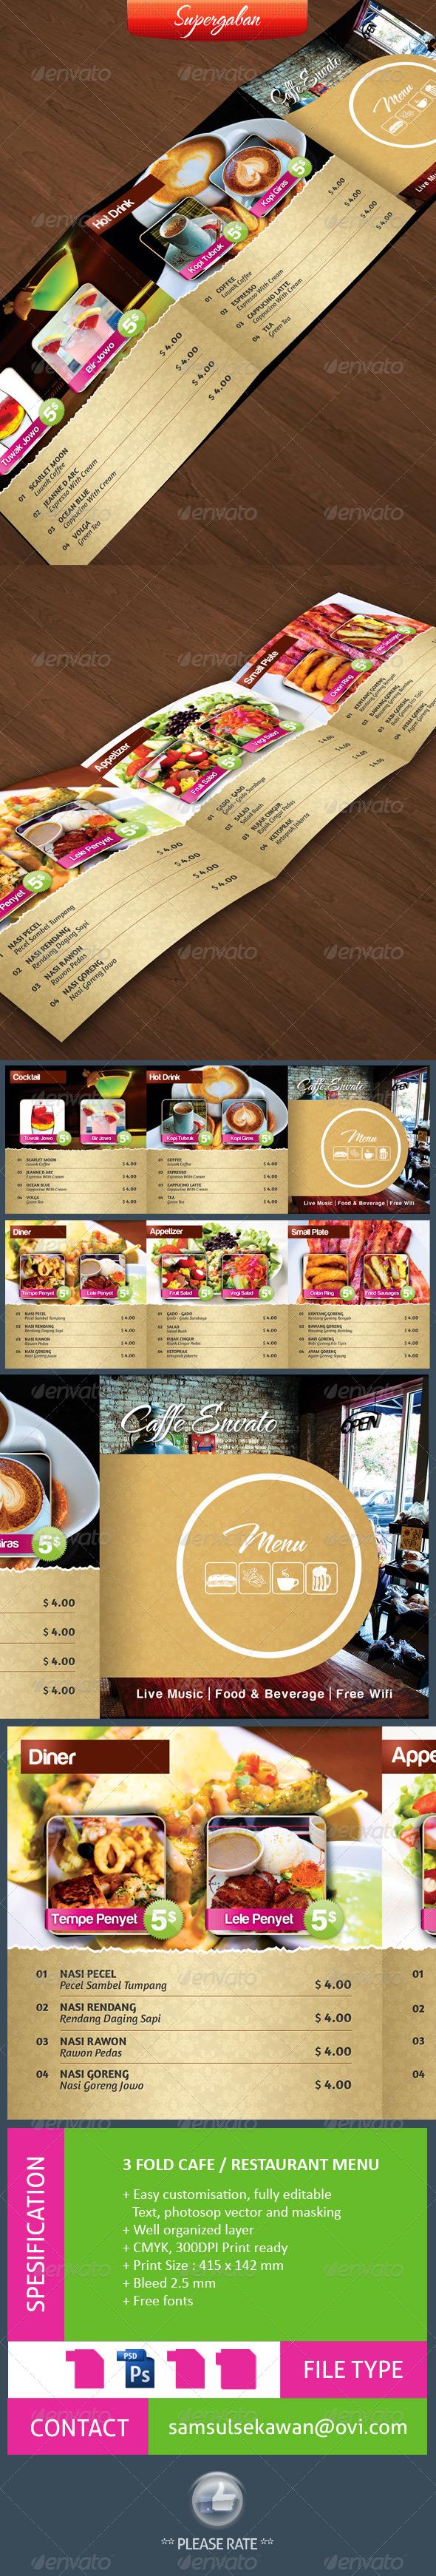 3 Fold Square Cafe Restaurant Menu - Food Menus Print Templates